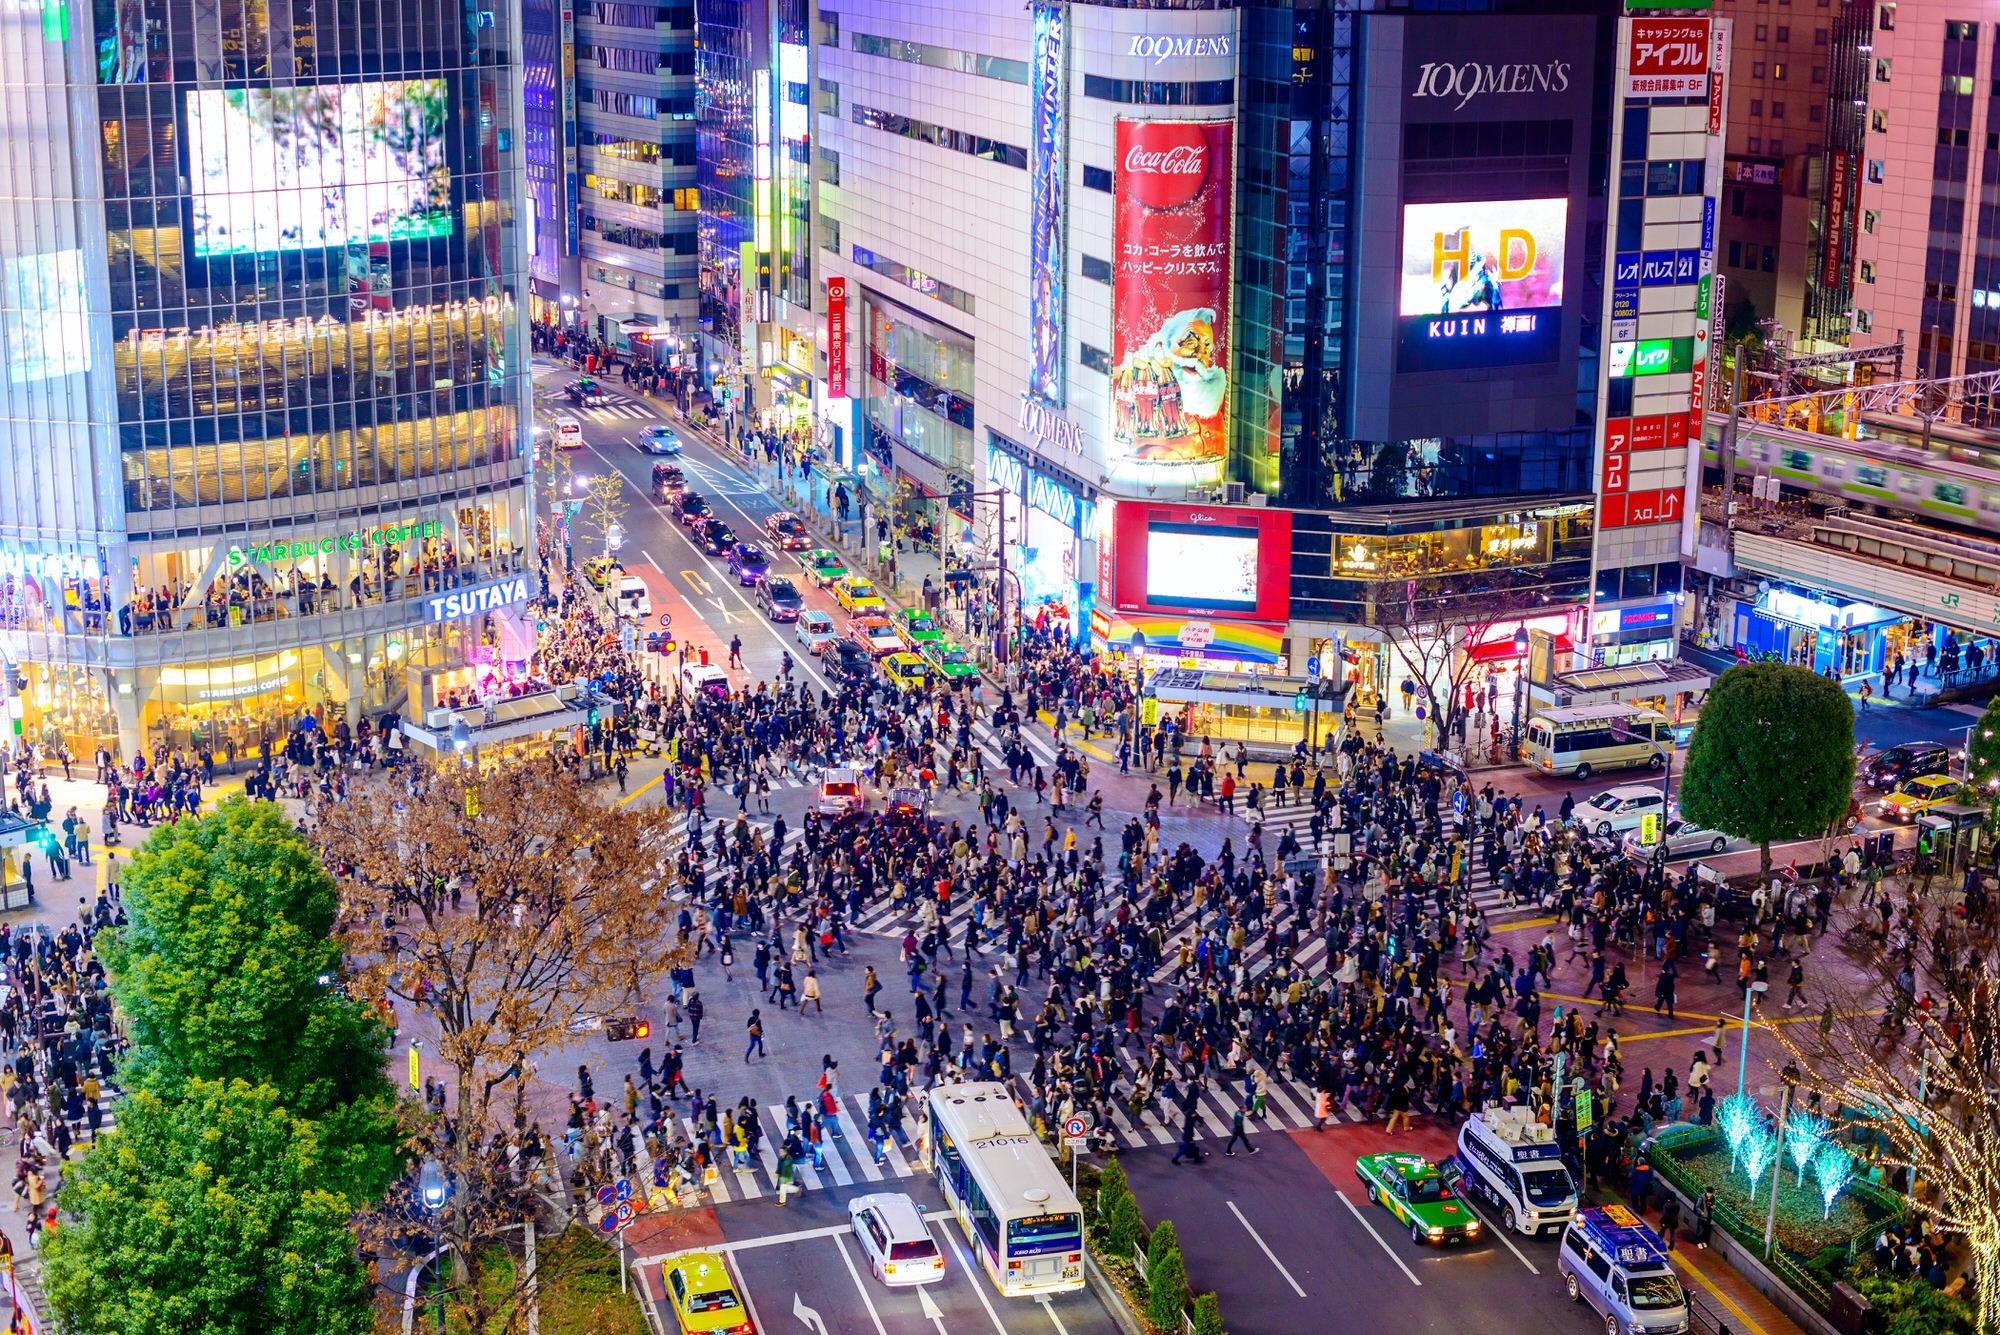 Aerial of pedestrians at Shibuya Crossing, Tokyo © Sean Pavone / Shutterstock